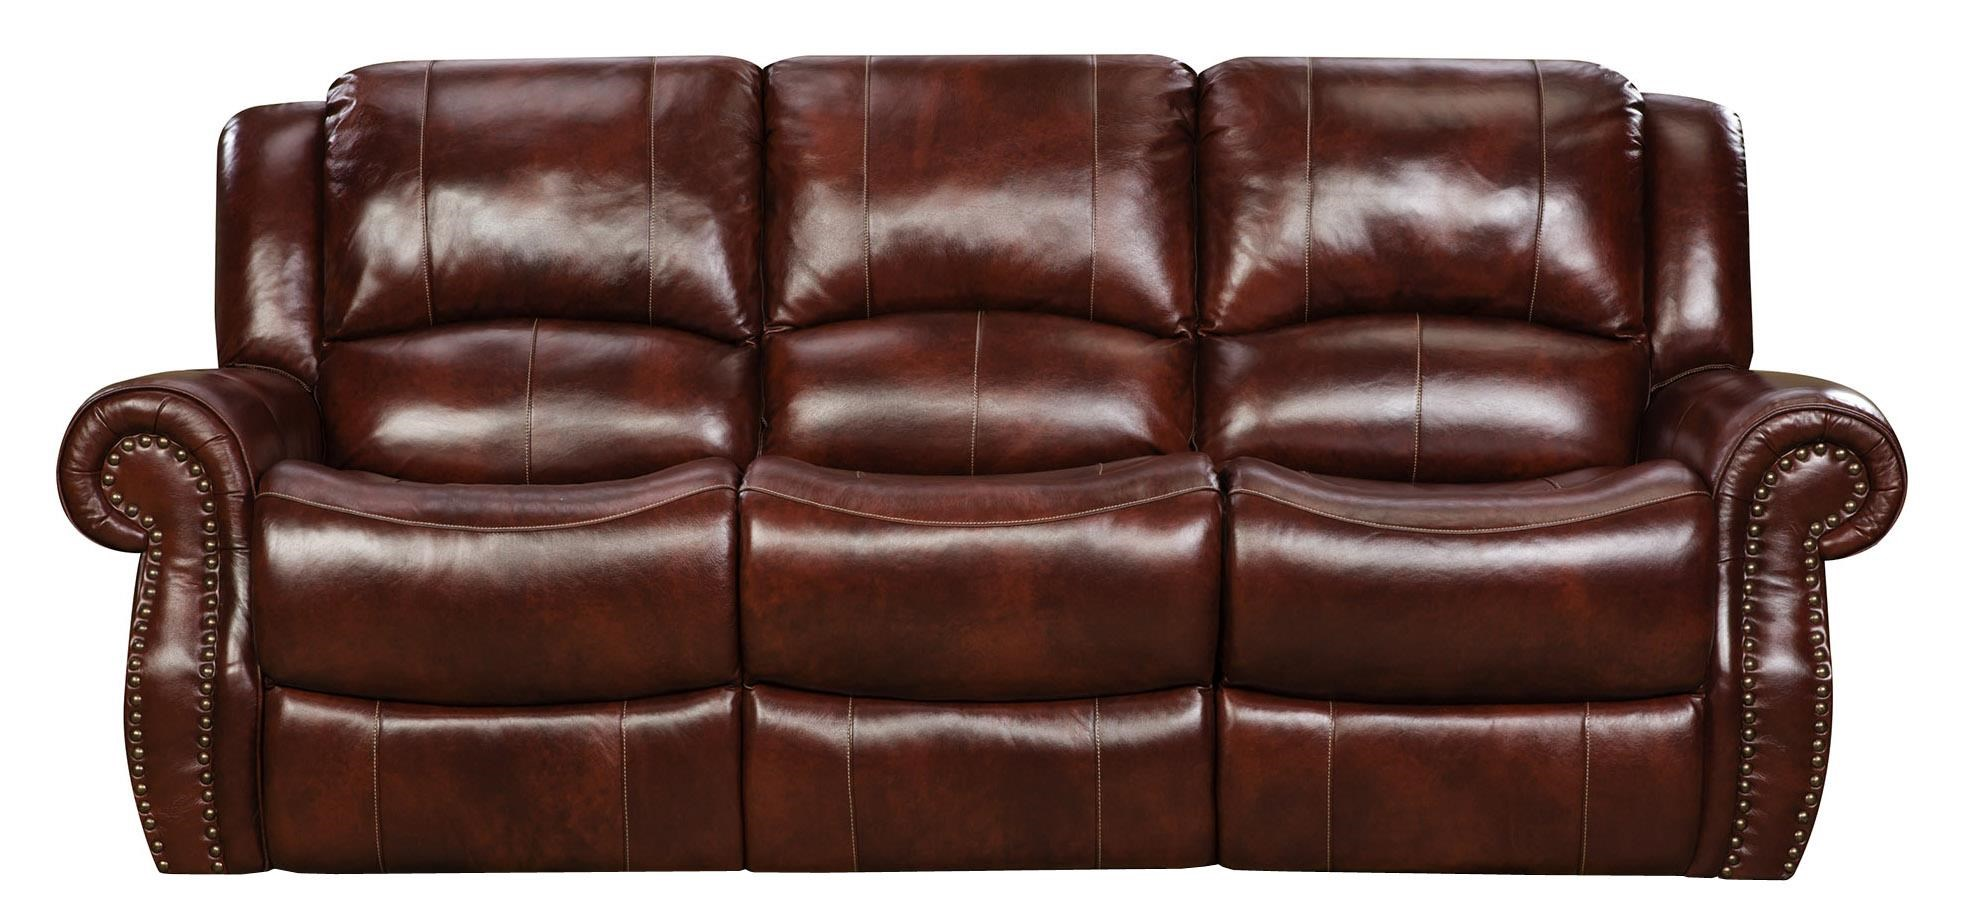 Wonderful Corinthian Alexander 99901 30 Alexander Leather Reclining Sofa